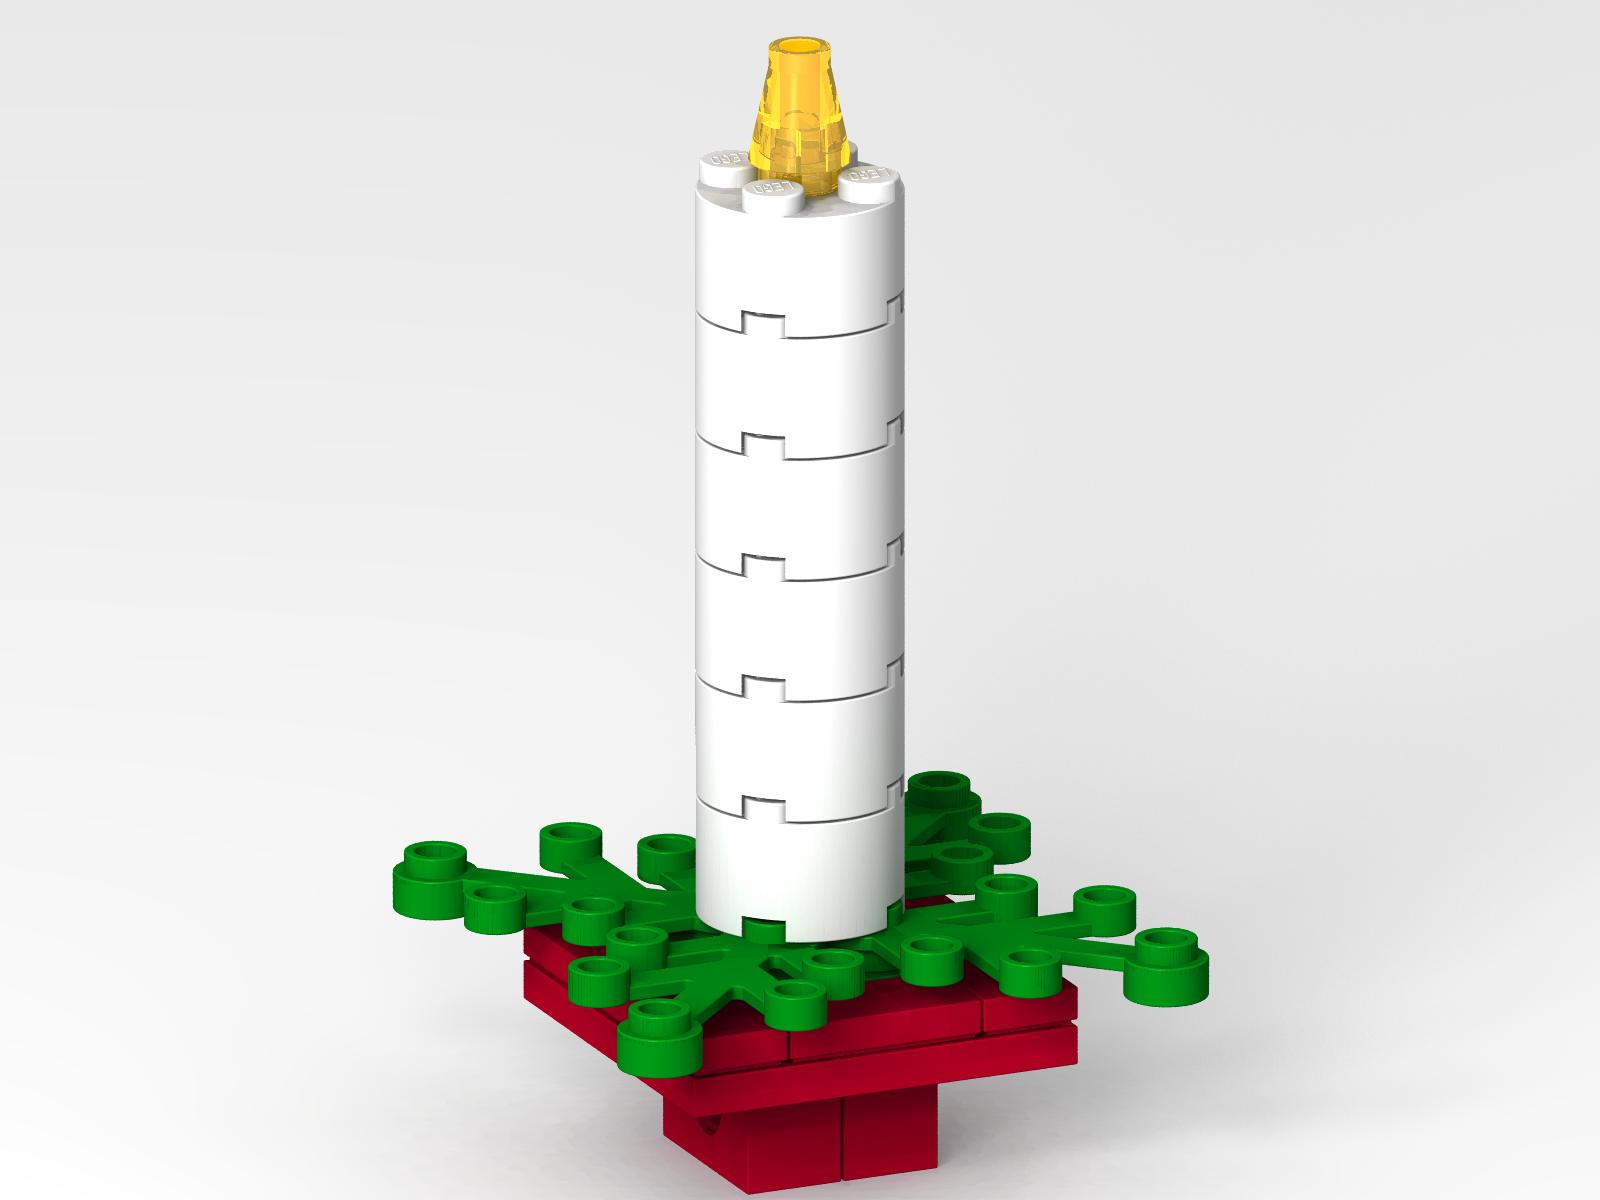 Lego candle tree ornament lego builds pinterest lego ornament